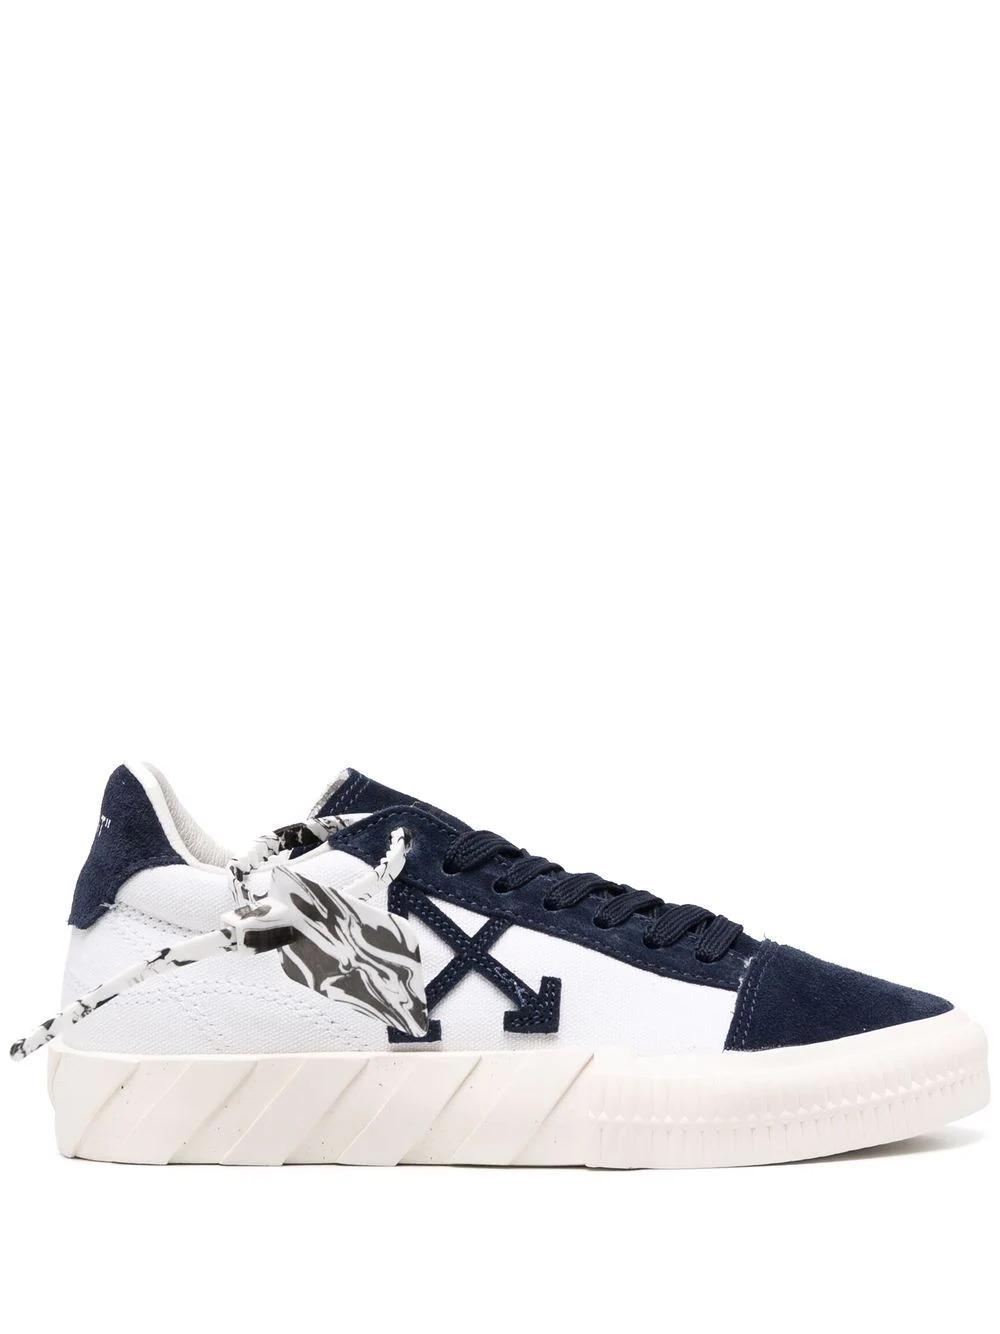 Low-Top Vulcanized Sneakers in Dunkelblau